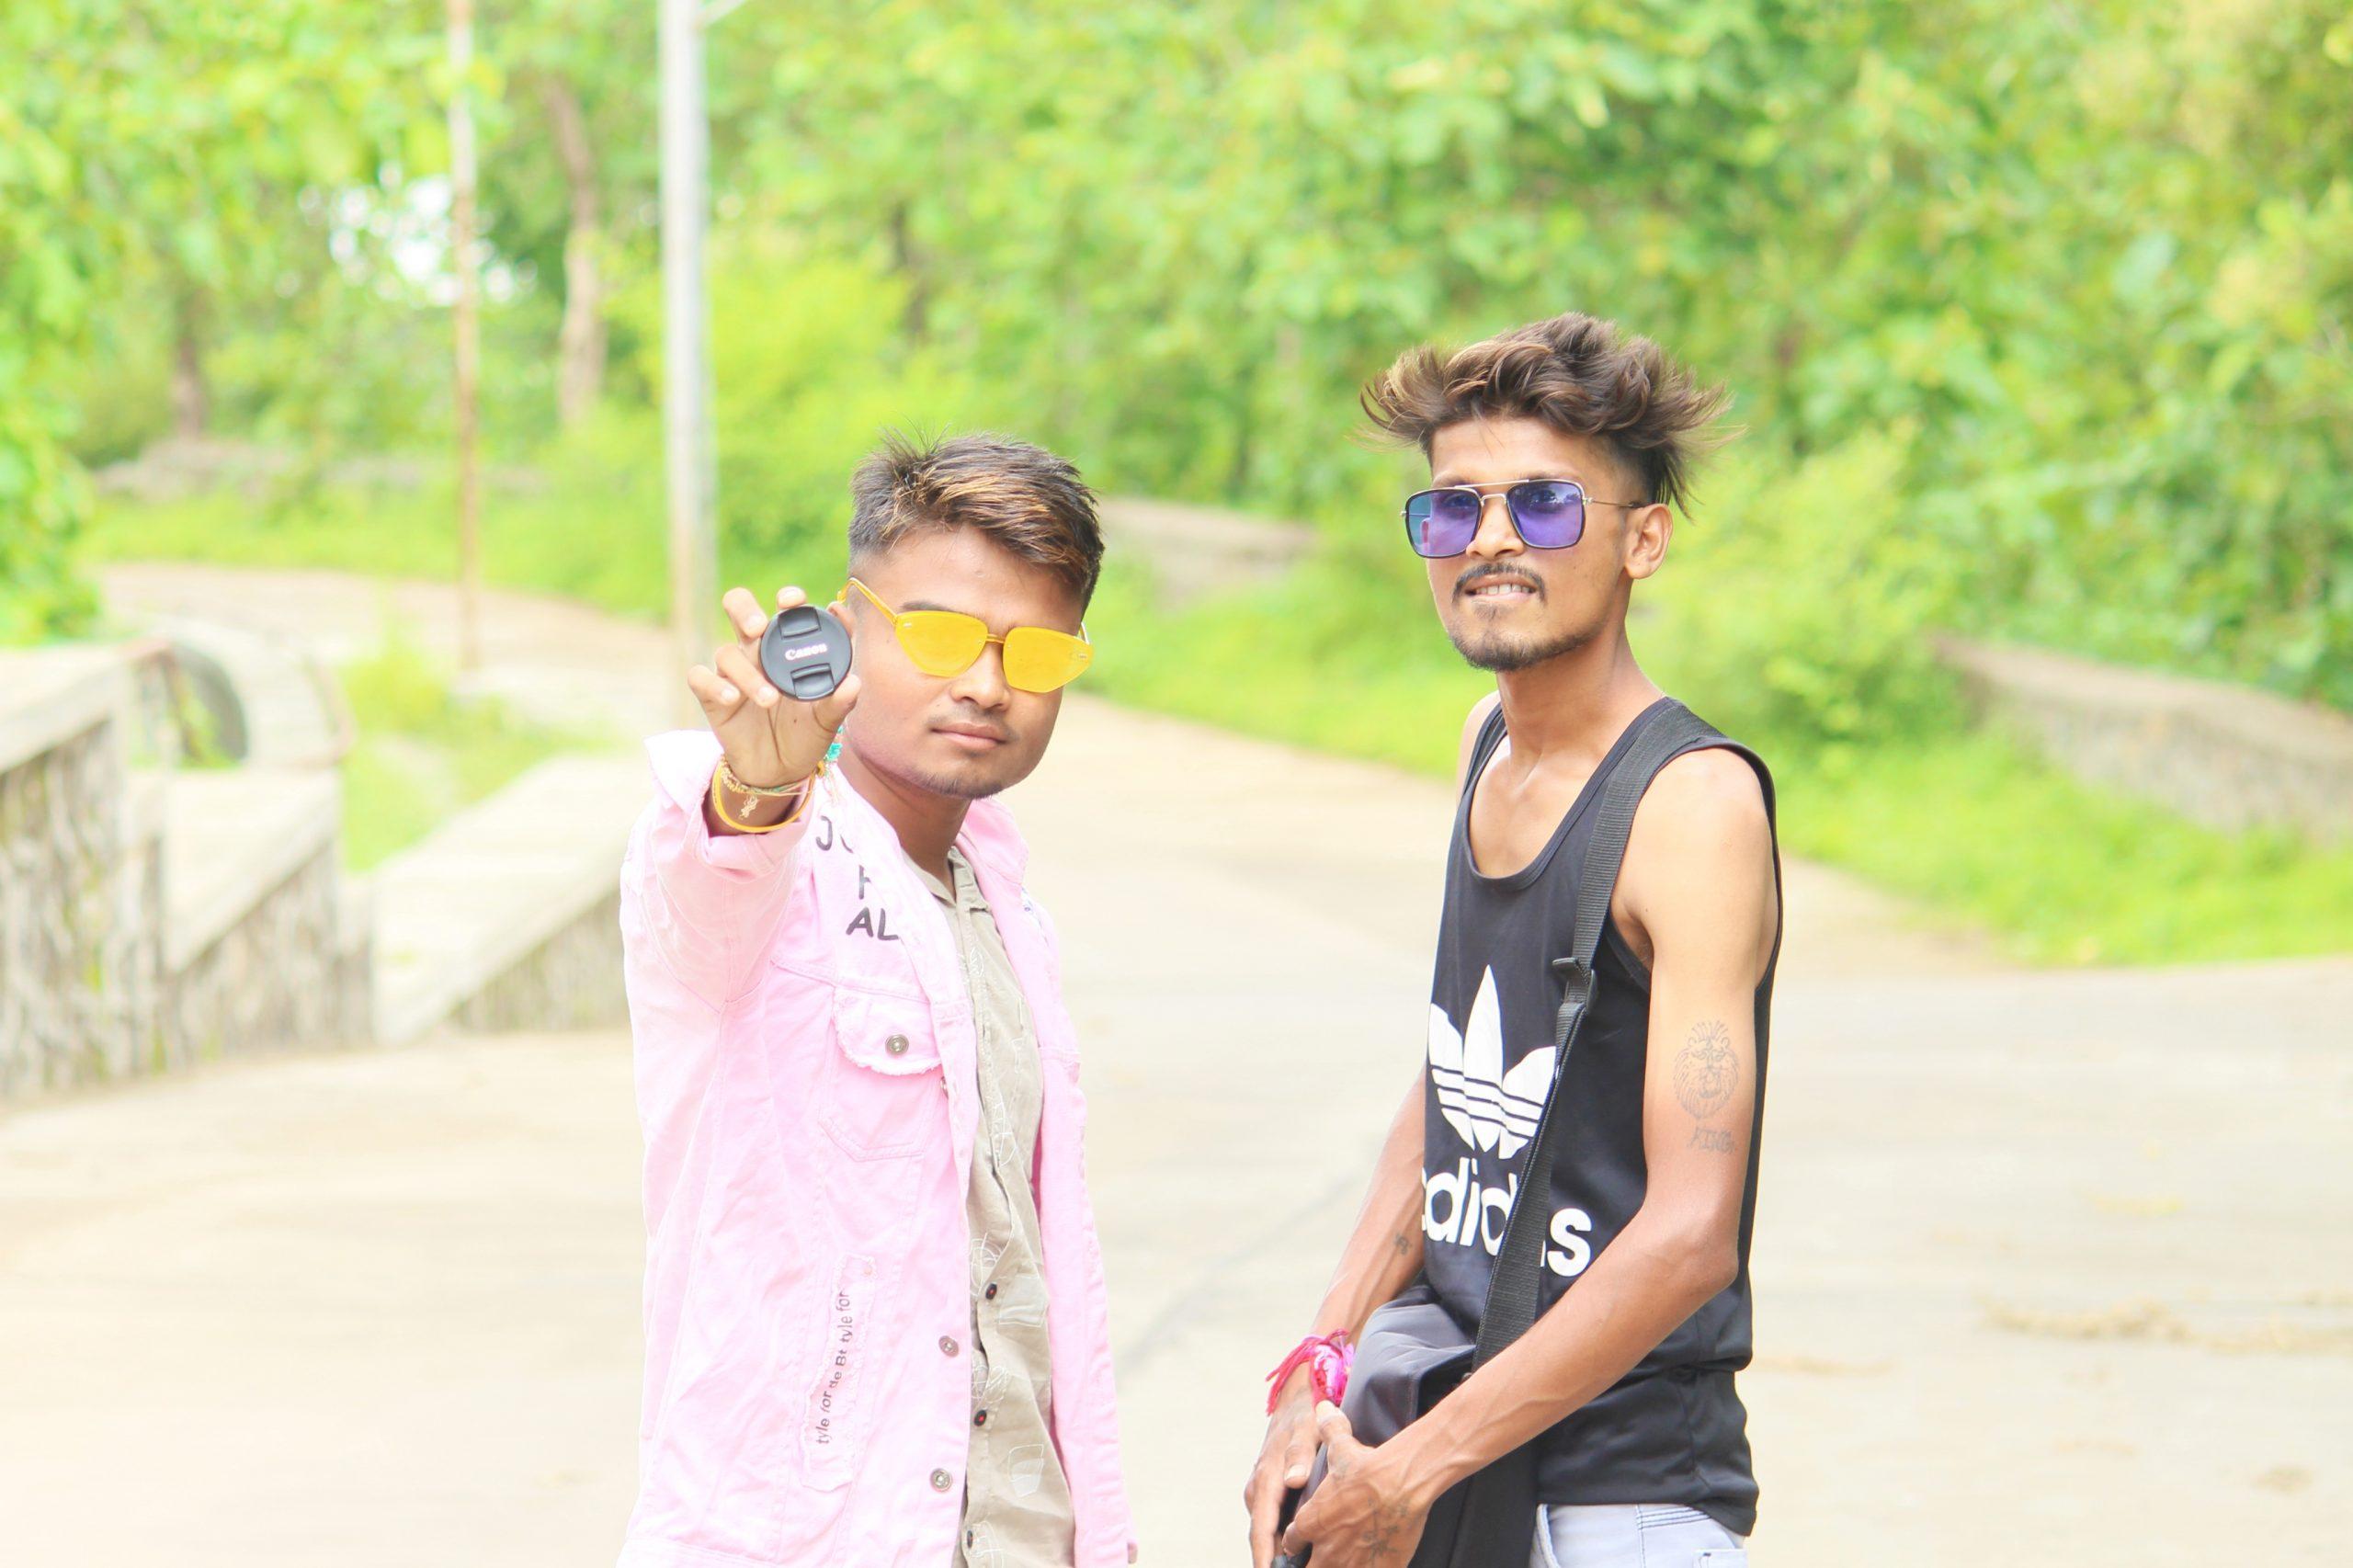 Two model boy posing with camera lens cap